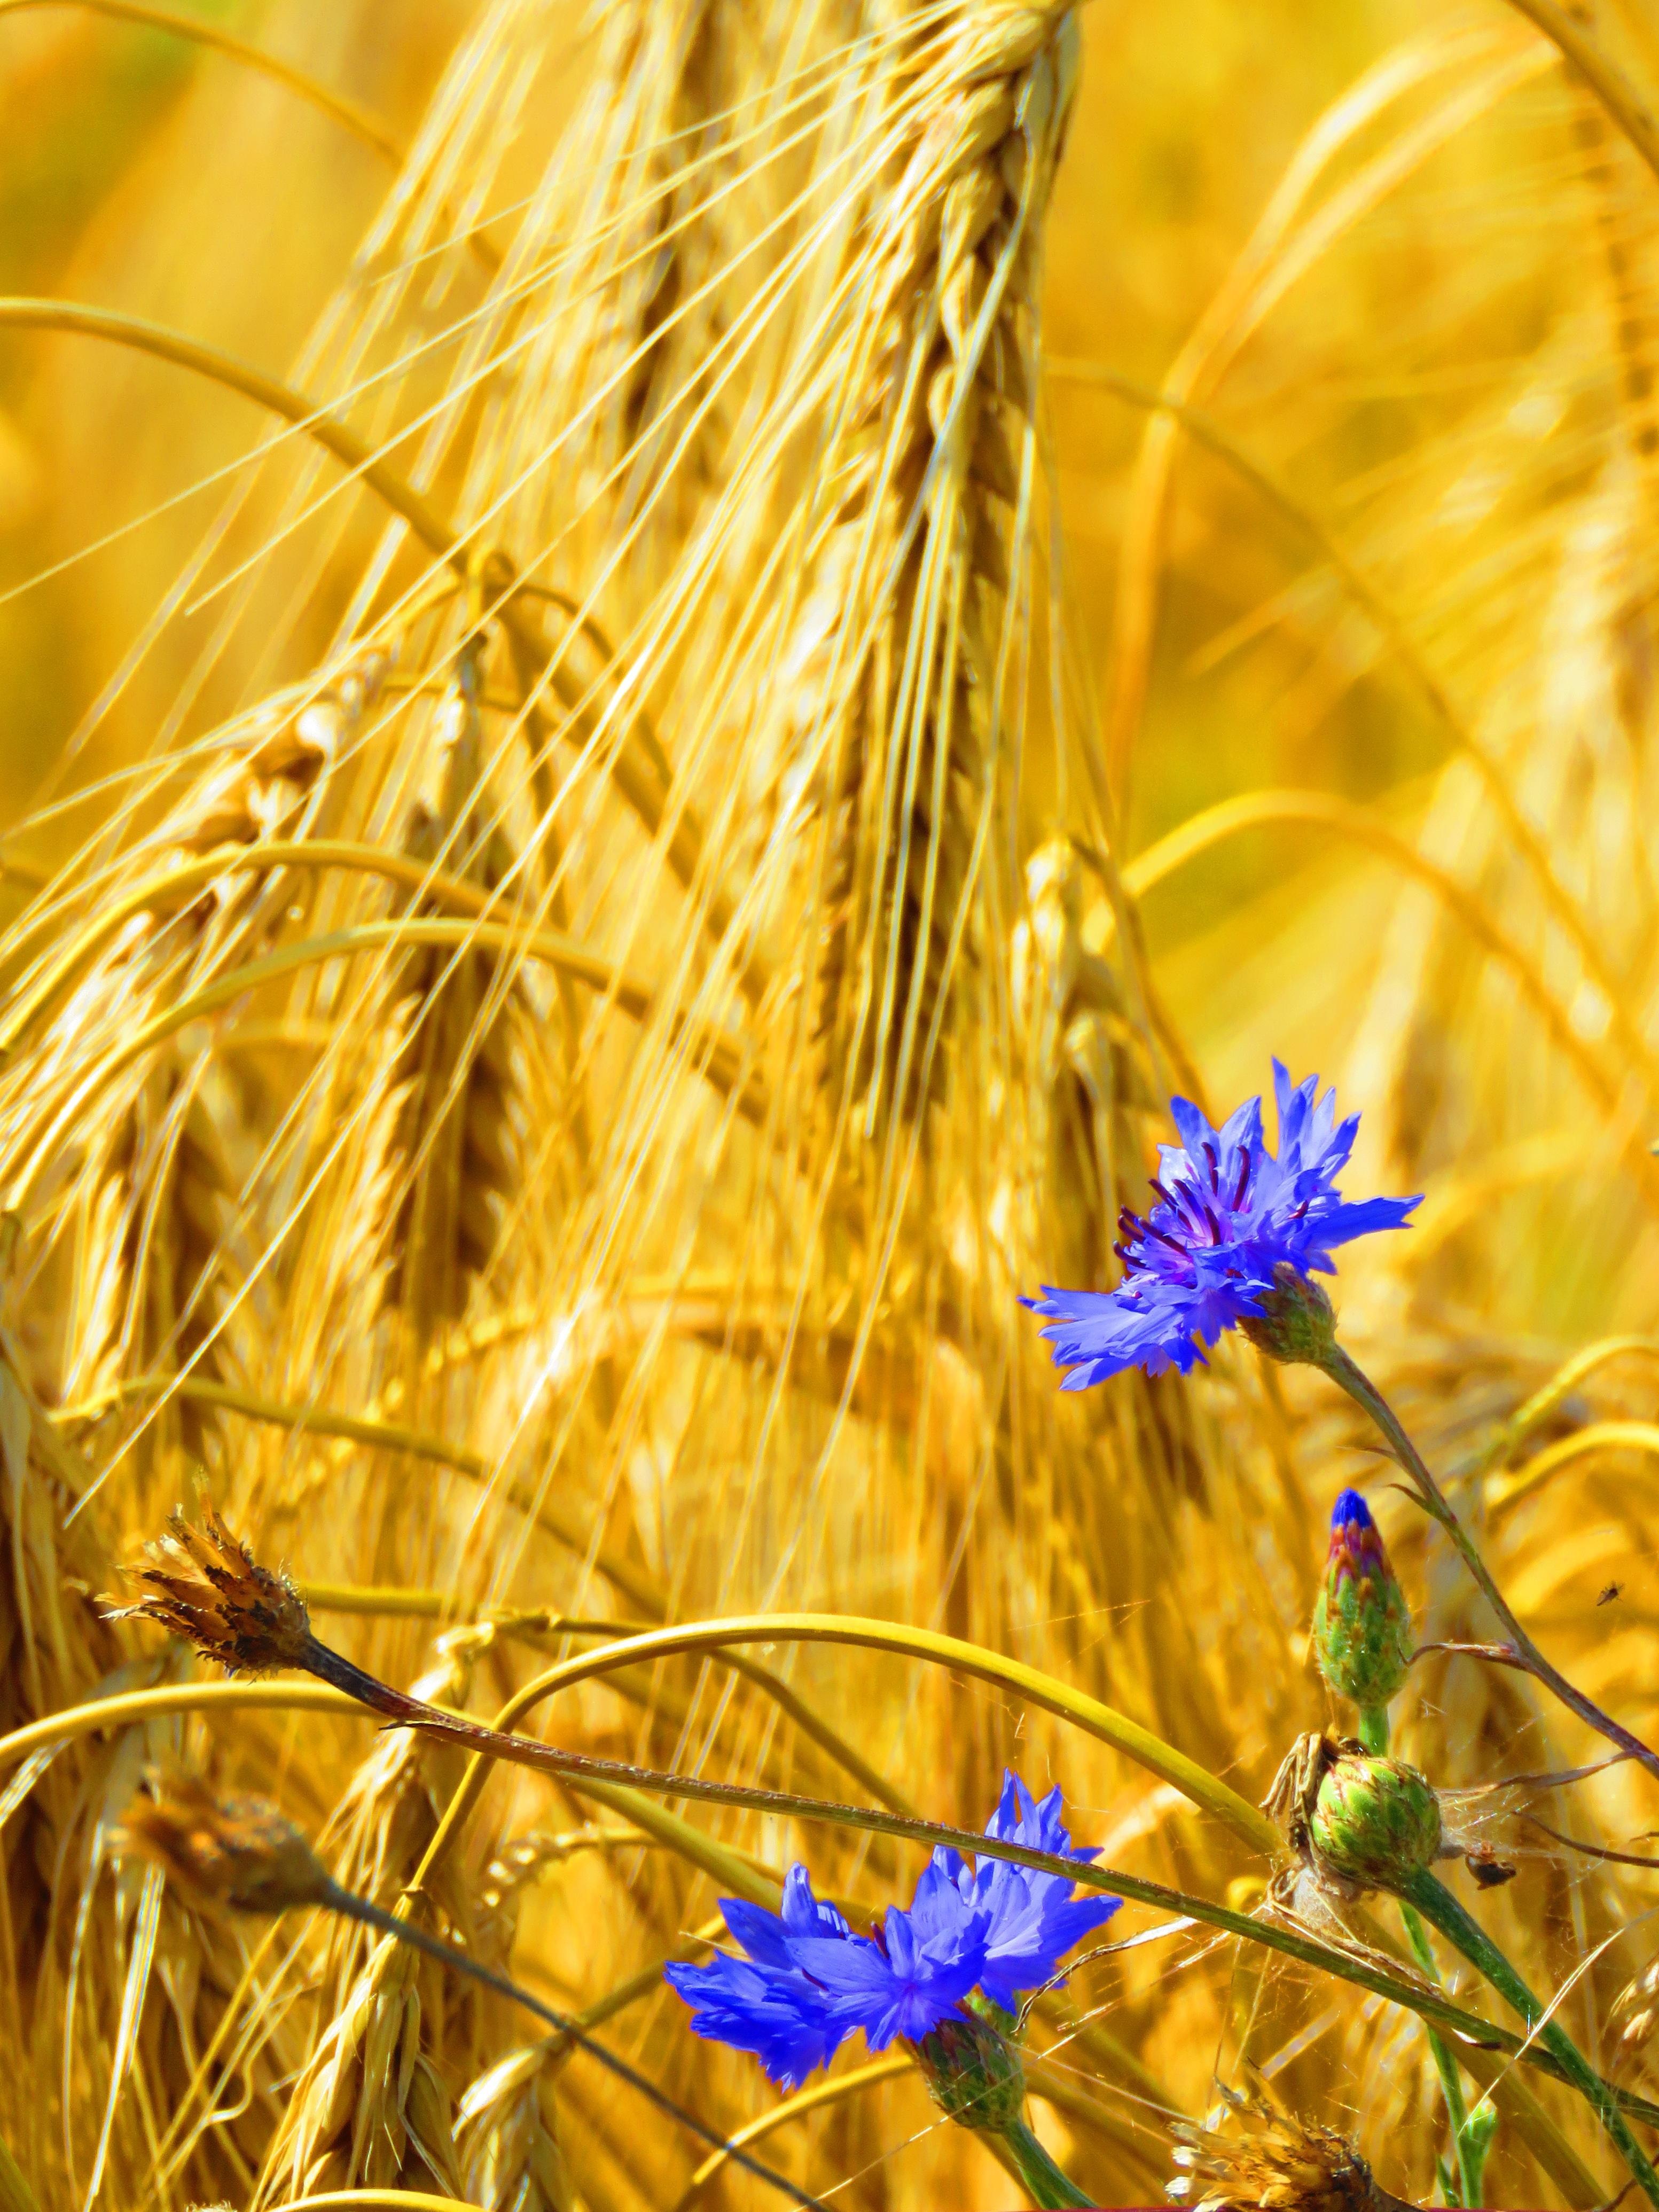 Картинки васильки и пшеница